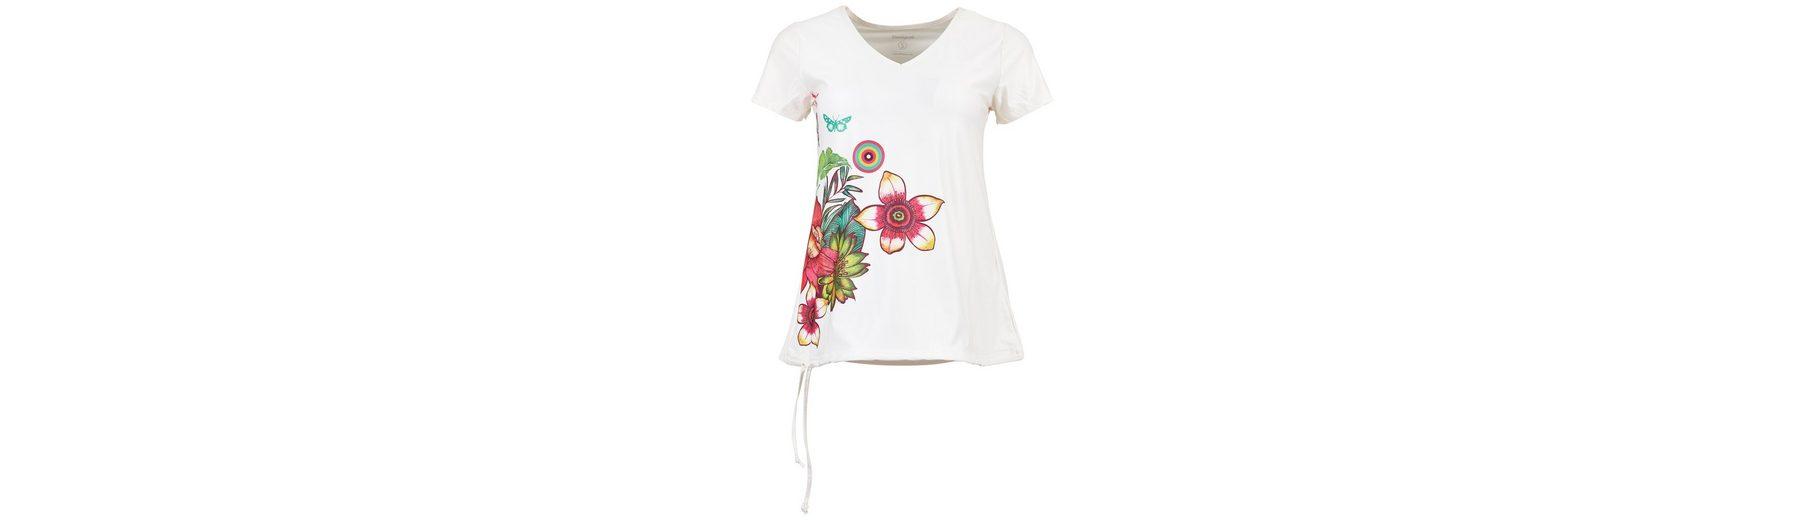 Desigual T-Shirt TS CD T-S V NECK T Auslassstellen Verkauf Online Billig 100% Garantiert Outlet Besten Großhandel Verkauf Billigsten Liefern Billige Online b0jWS